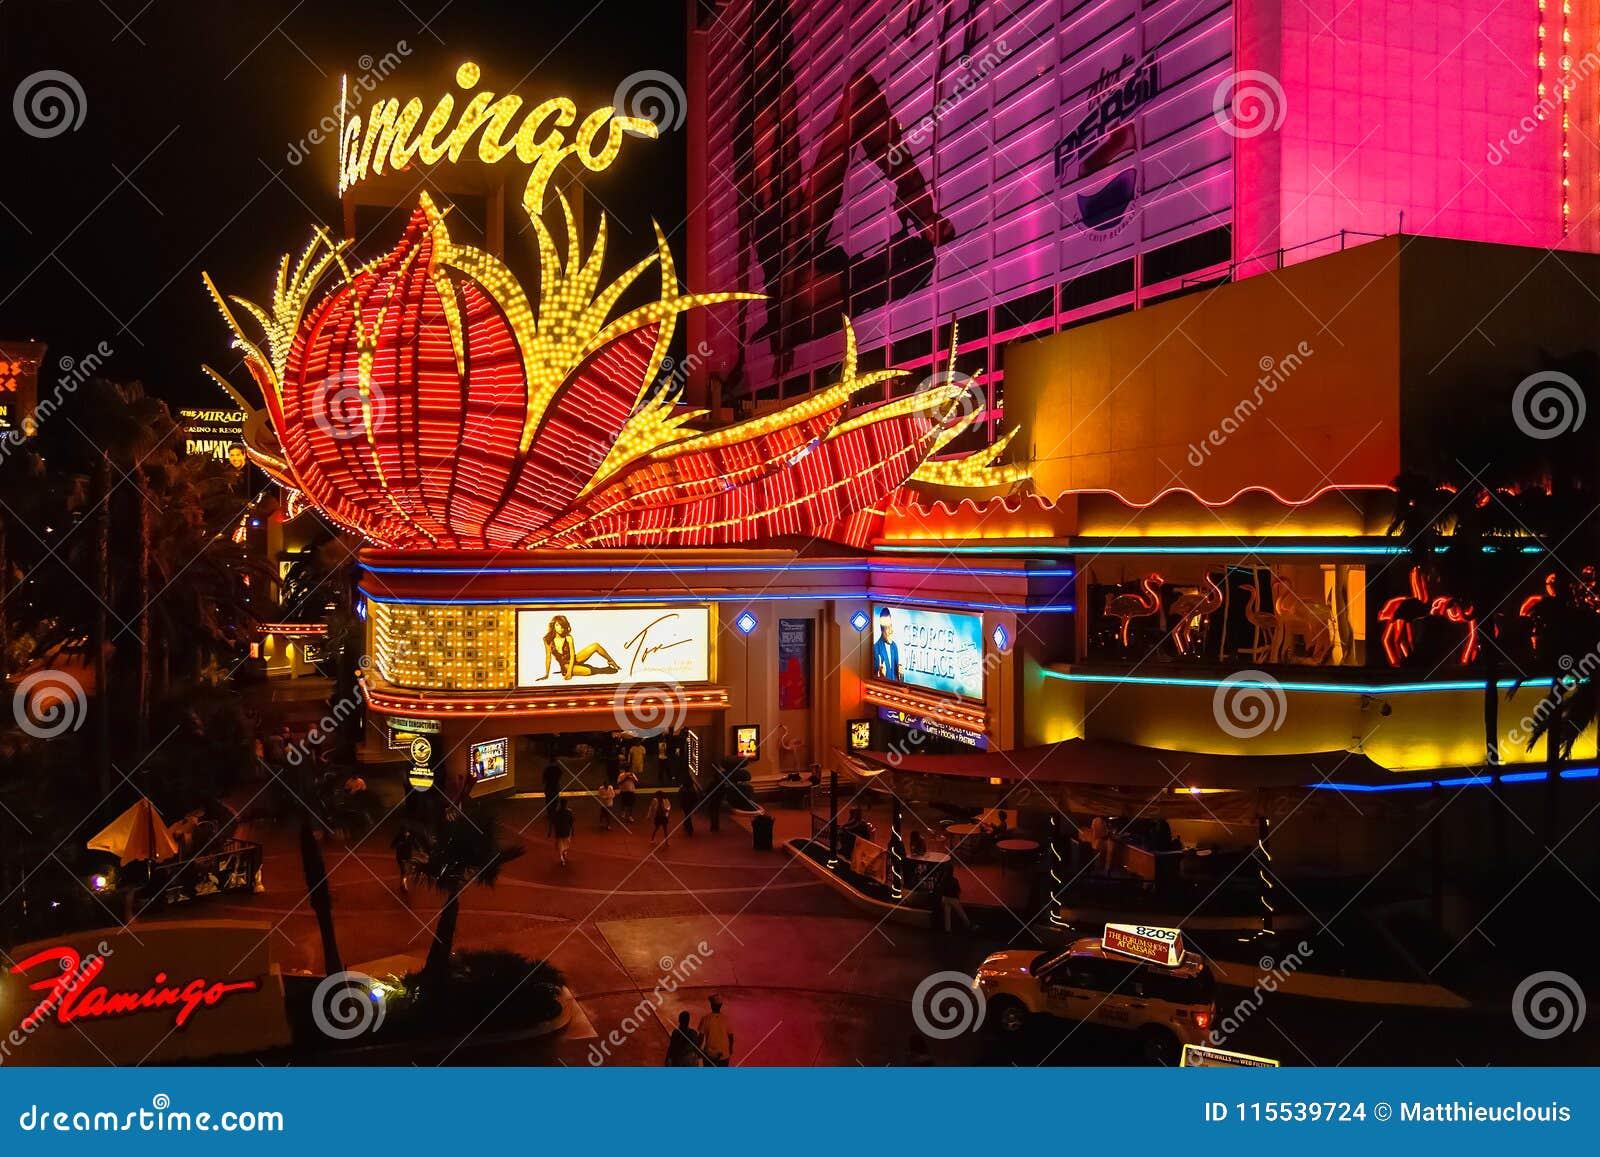 The Flamingo casino by night